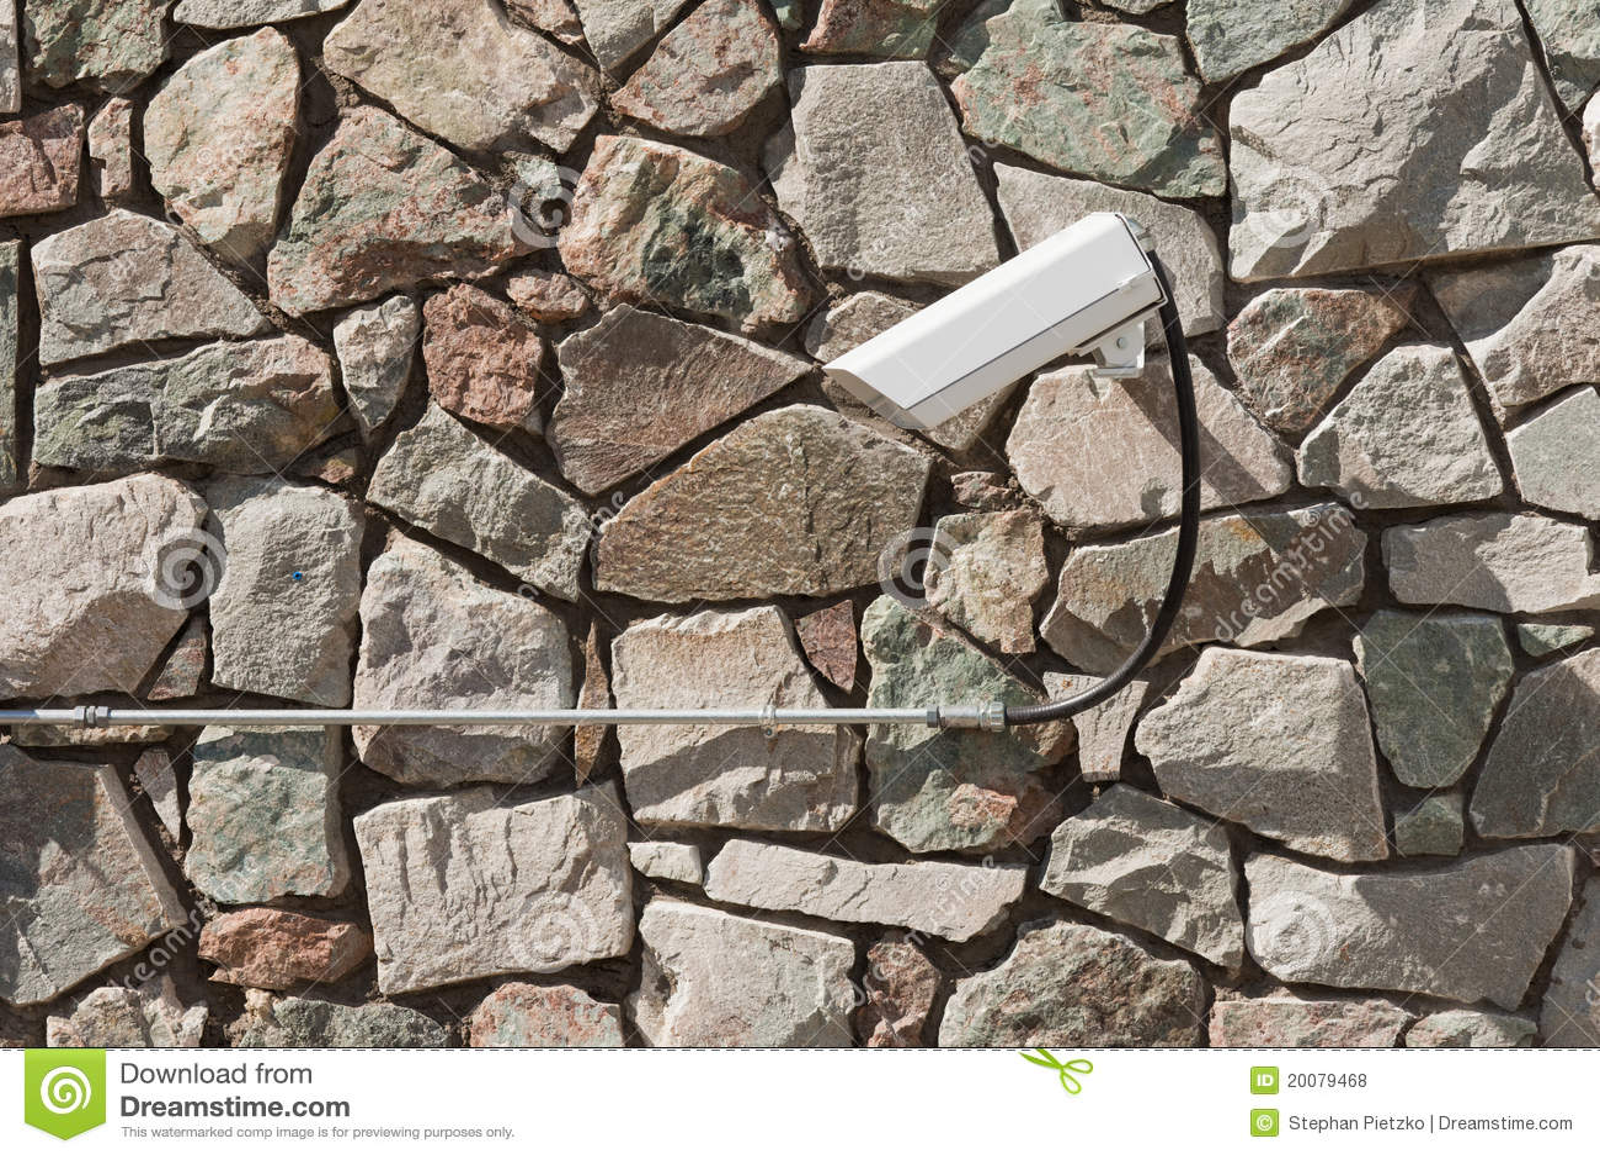 Rock Camera Surveillance : Rock facade with security surveillance camera stock photo image of